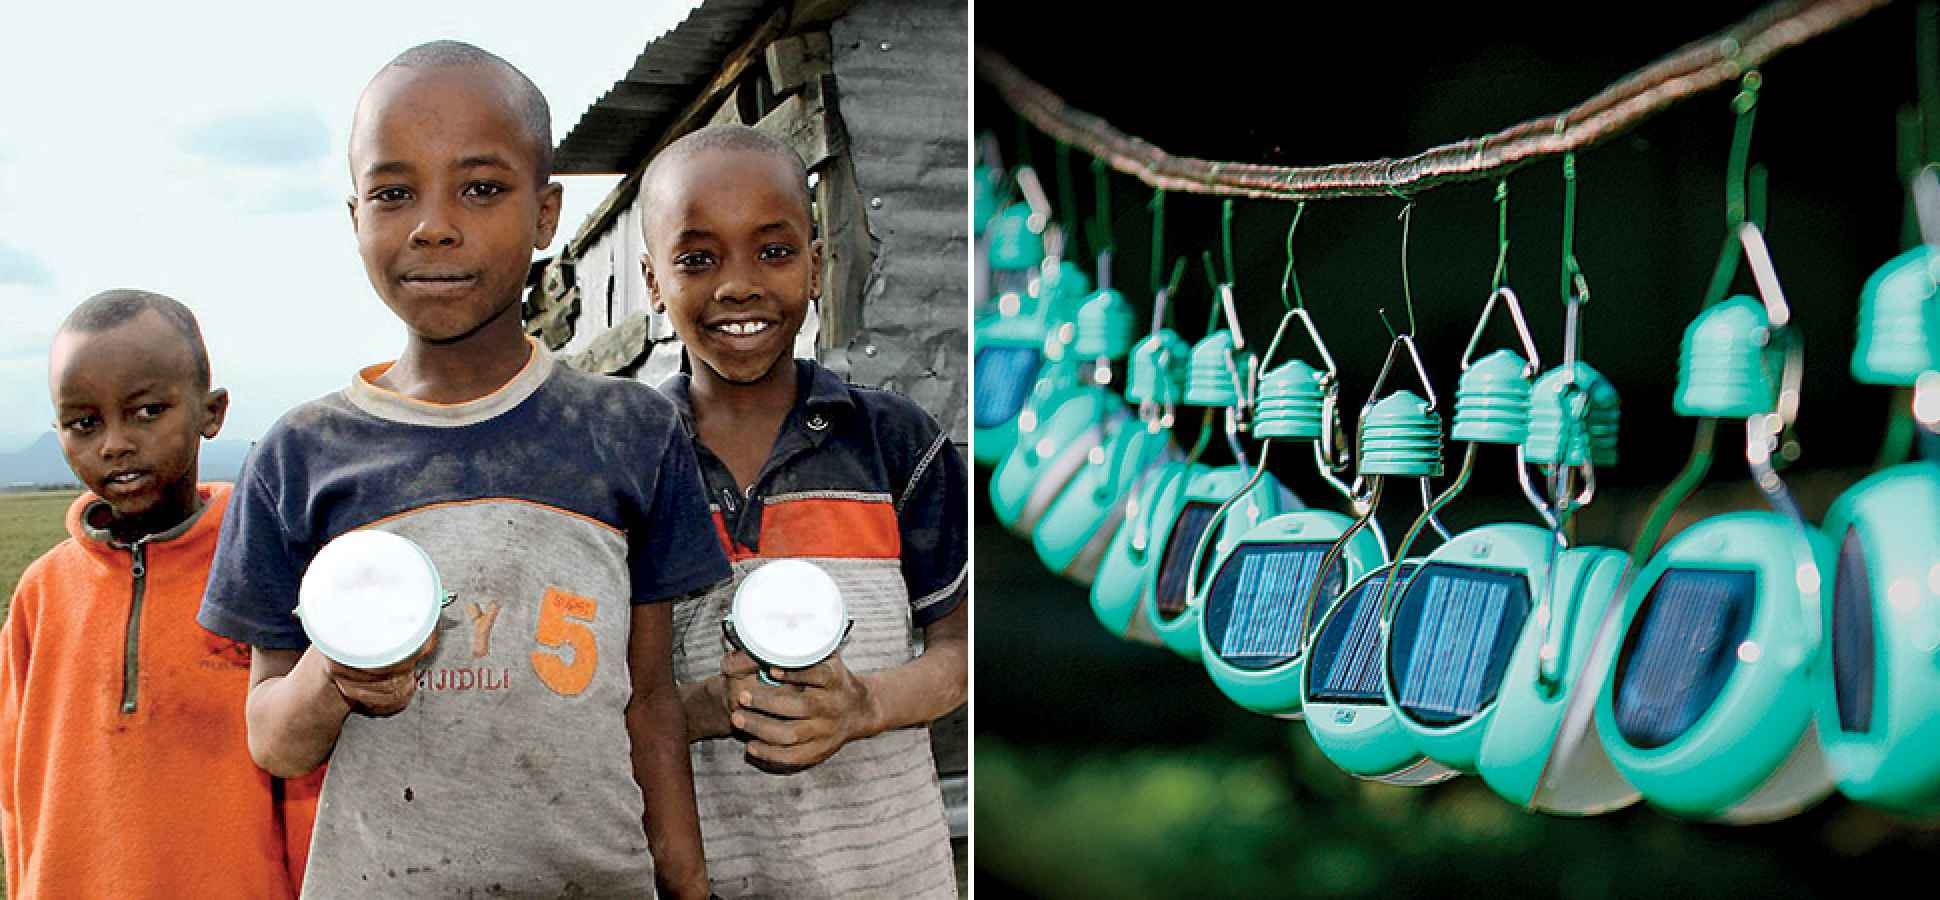 The Entrepreneur Lighting Up Communities in Need